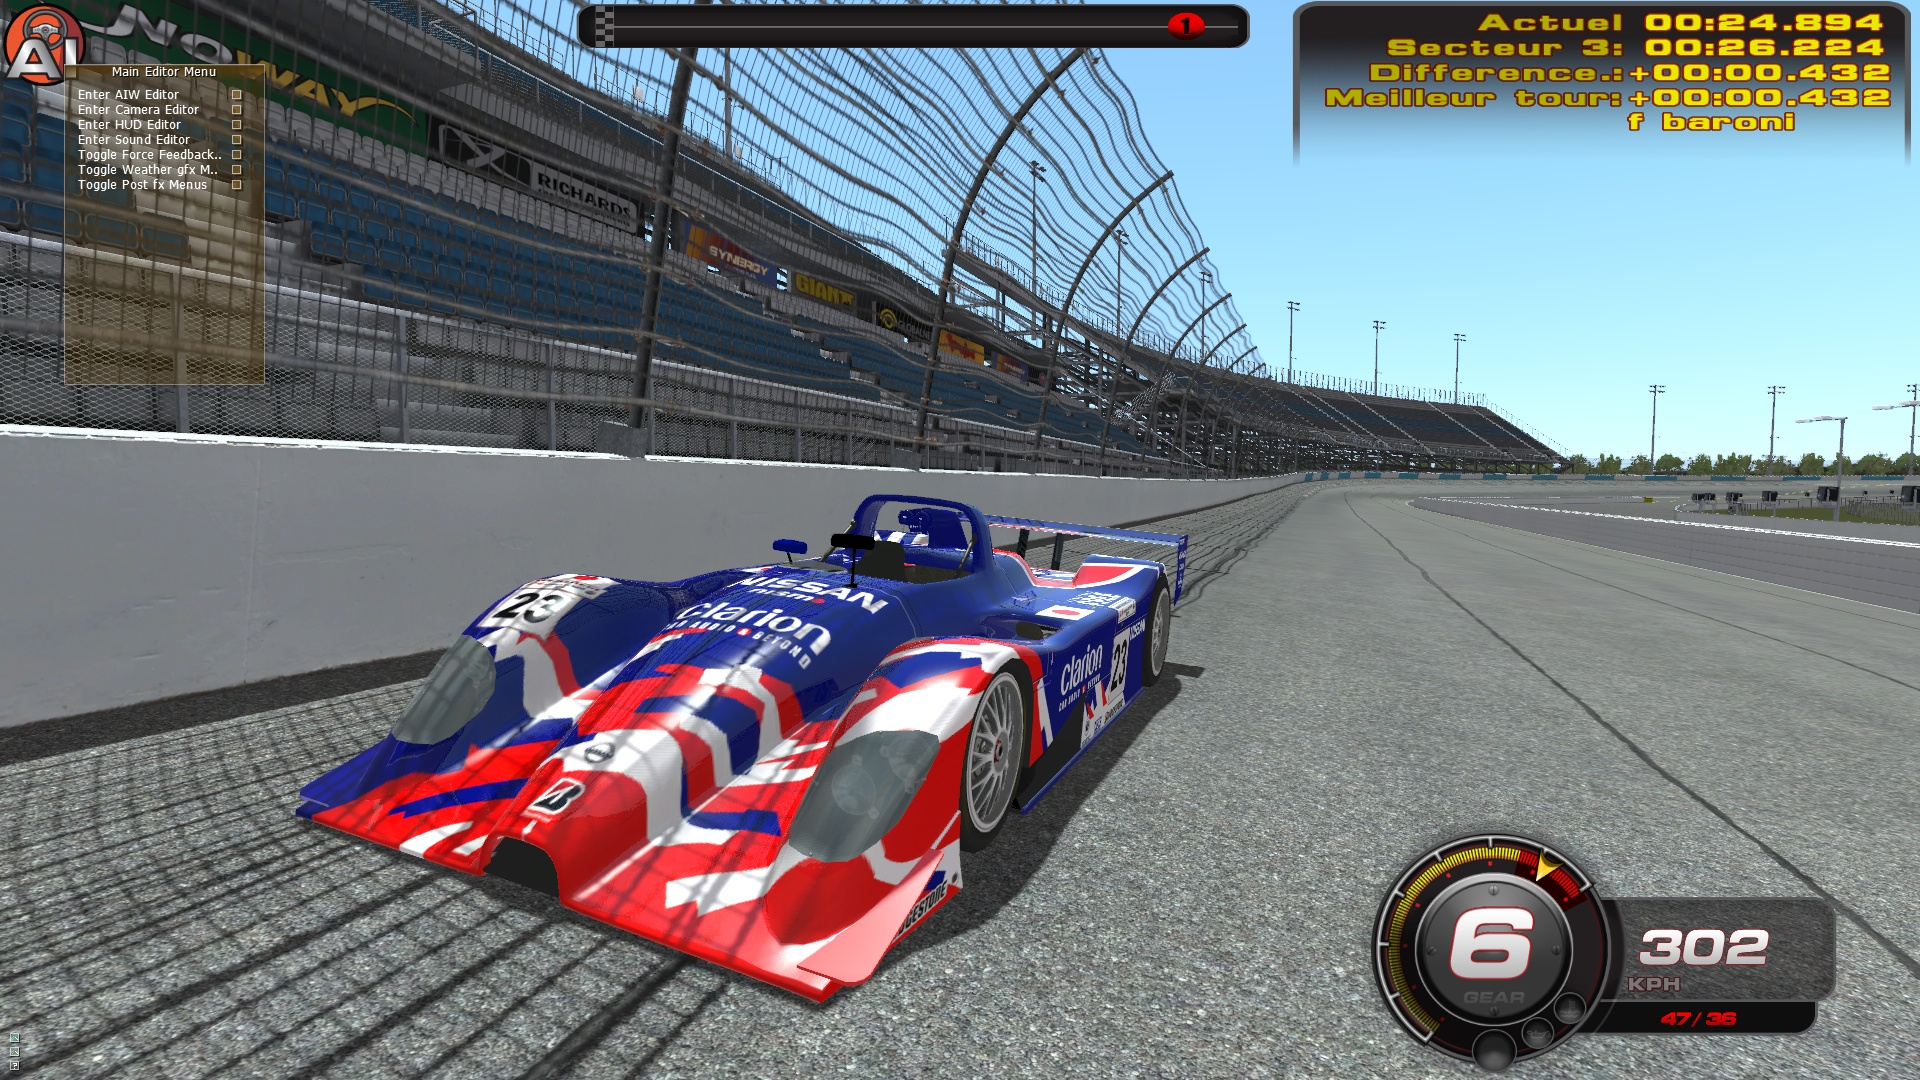 Превью Le Mans 1999 на rFactor 2